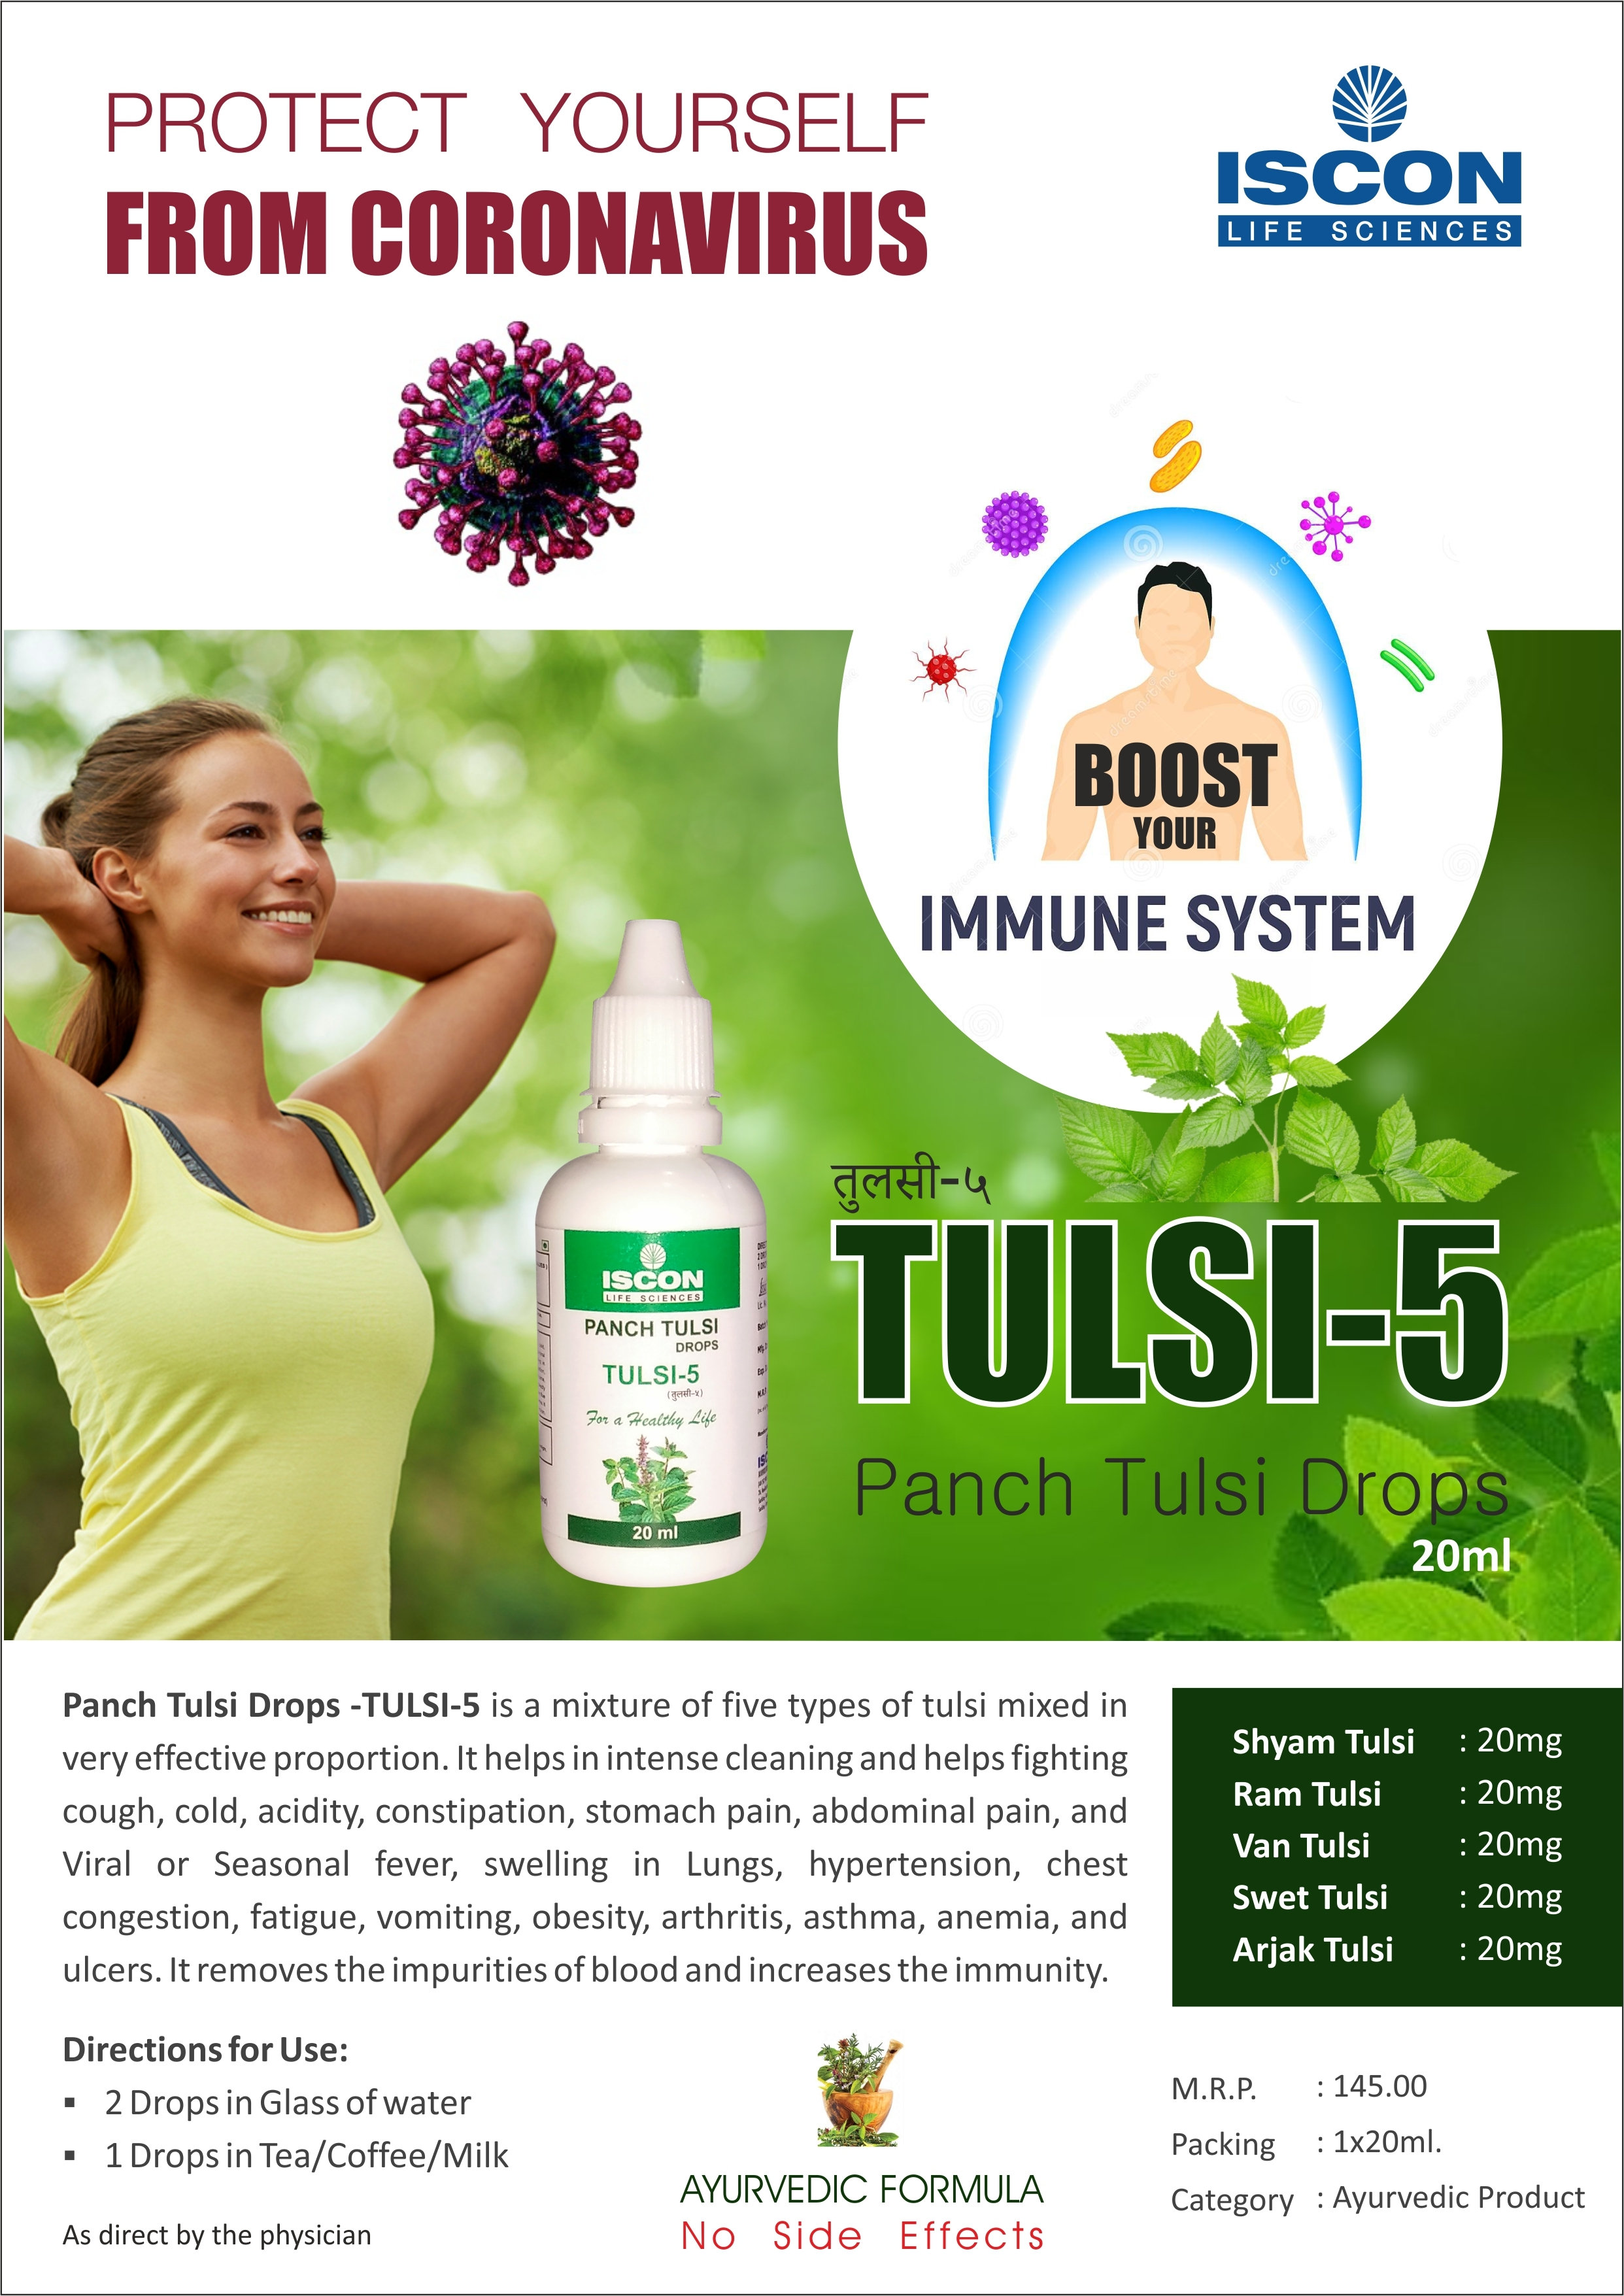 TULSI-5 Panch (Tulsi Drops 20ml)